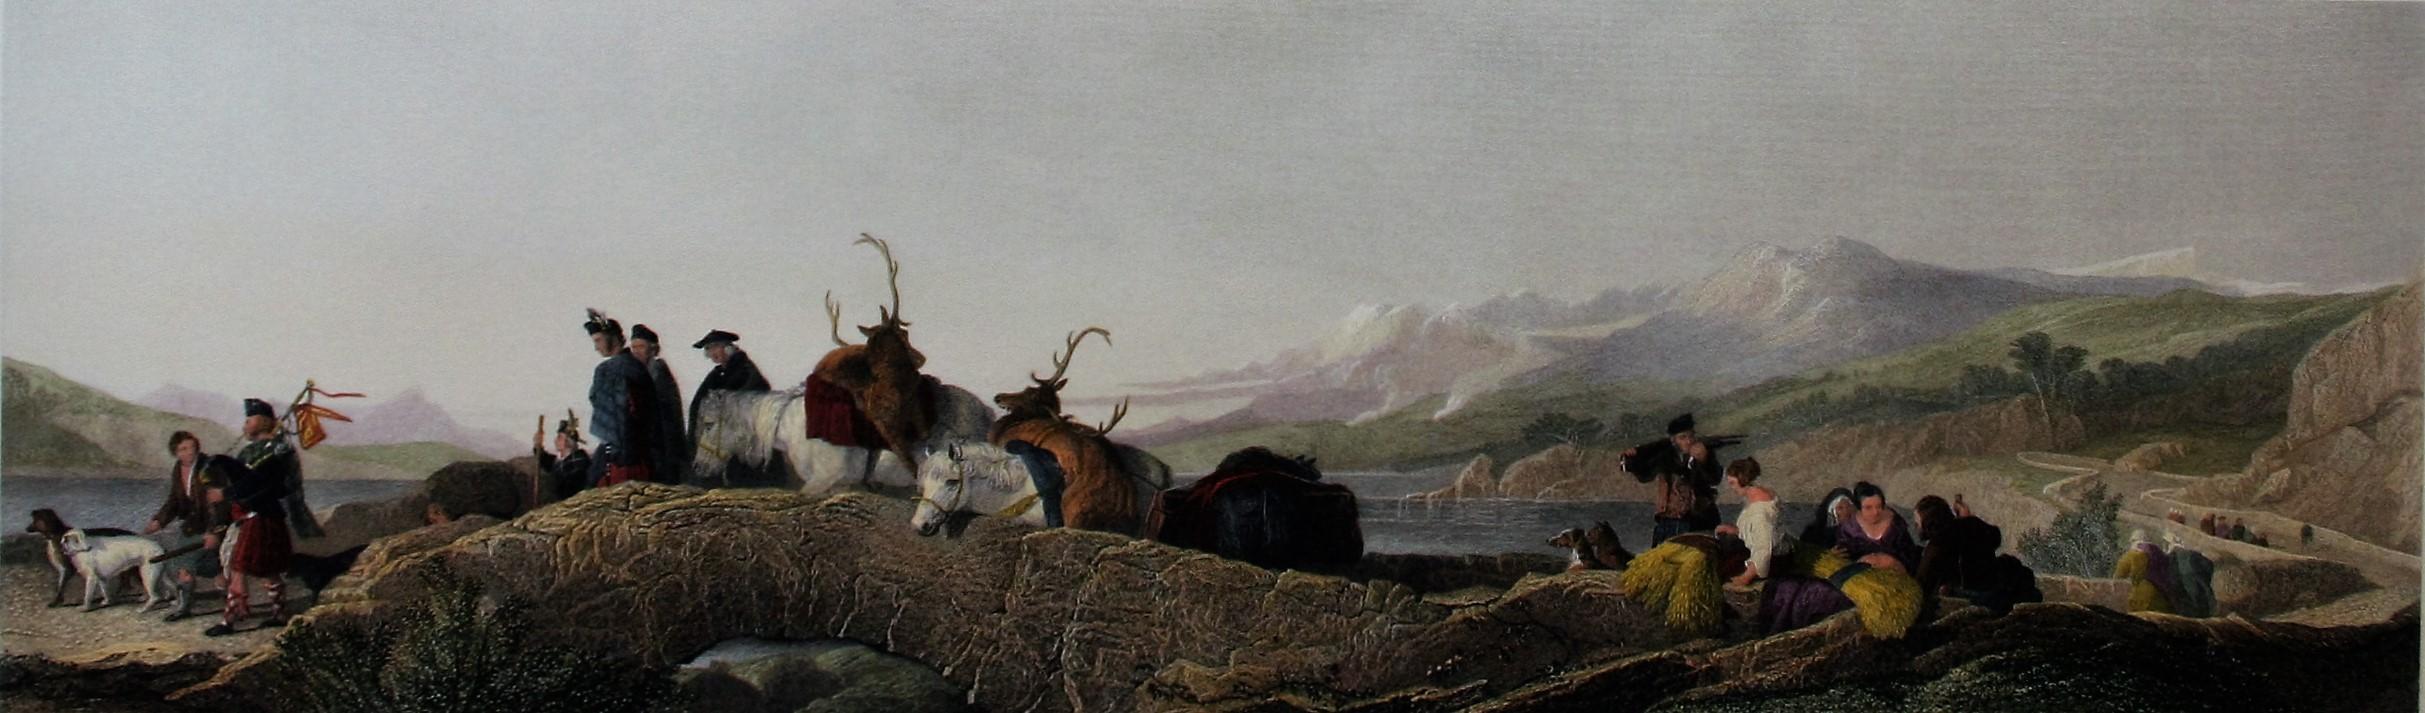 Sir Edwin Henry Landseer 1802-1873